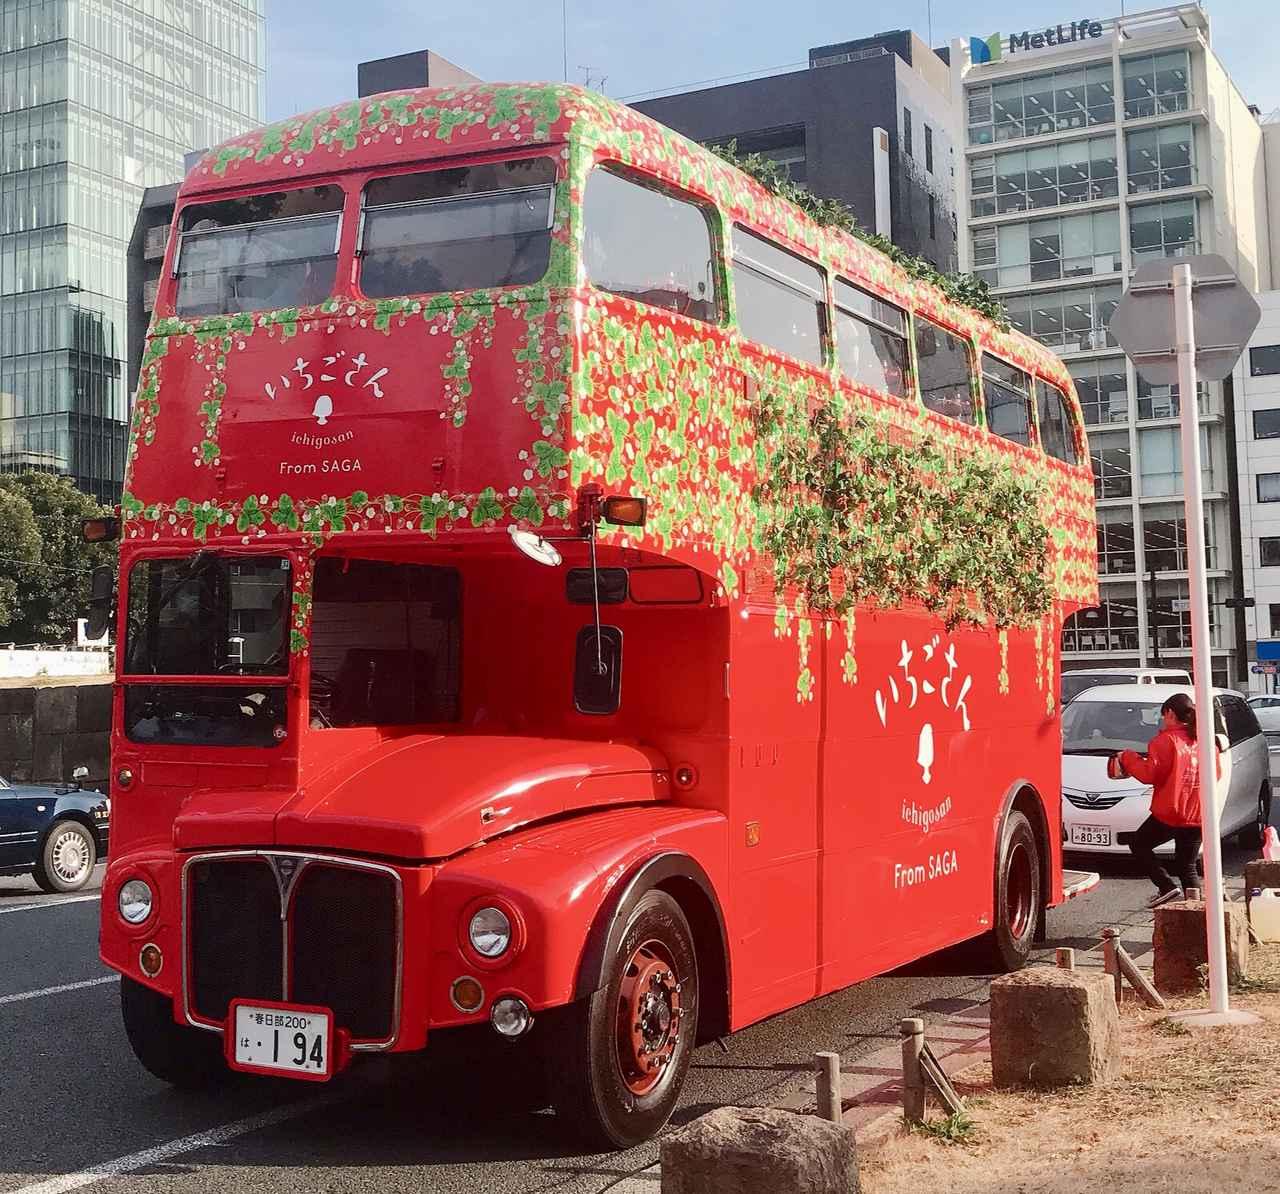 Images : 5番目の画像 - 「【試食レポ】佐賀県の新しいブランドいちご「いちごさん」を食べながら都内を巡る「いちごさんバス」運行!」のアルバム - カワコレメディア | 最新トレンド・コスメ・スイーツなど女の子のためのガールズメディアです!